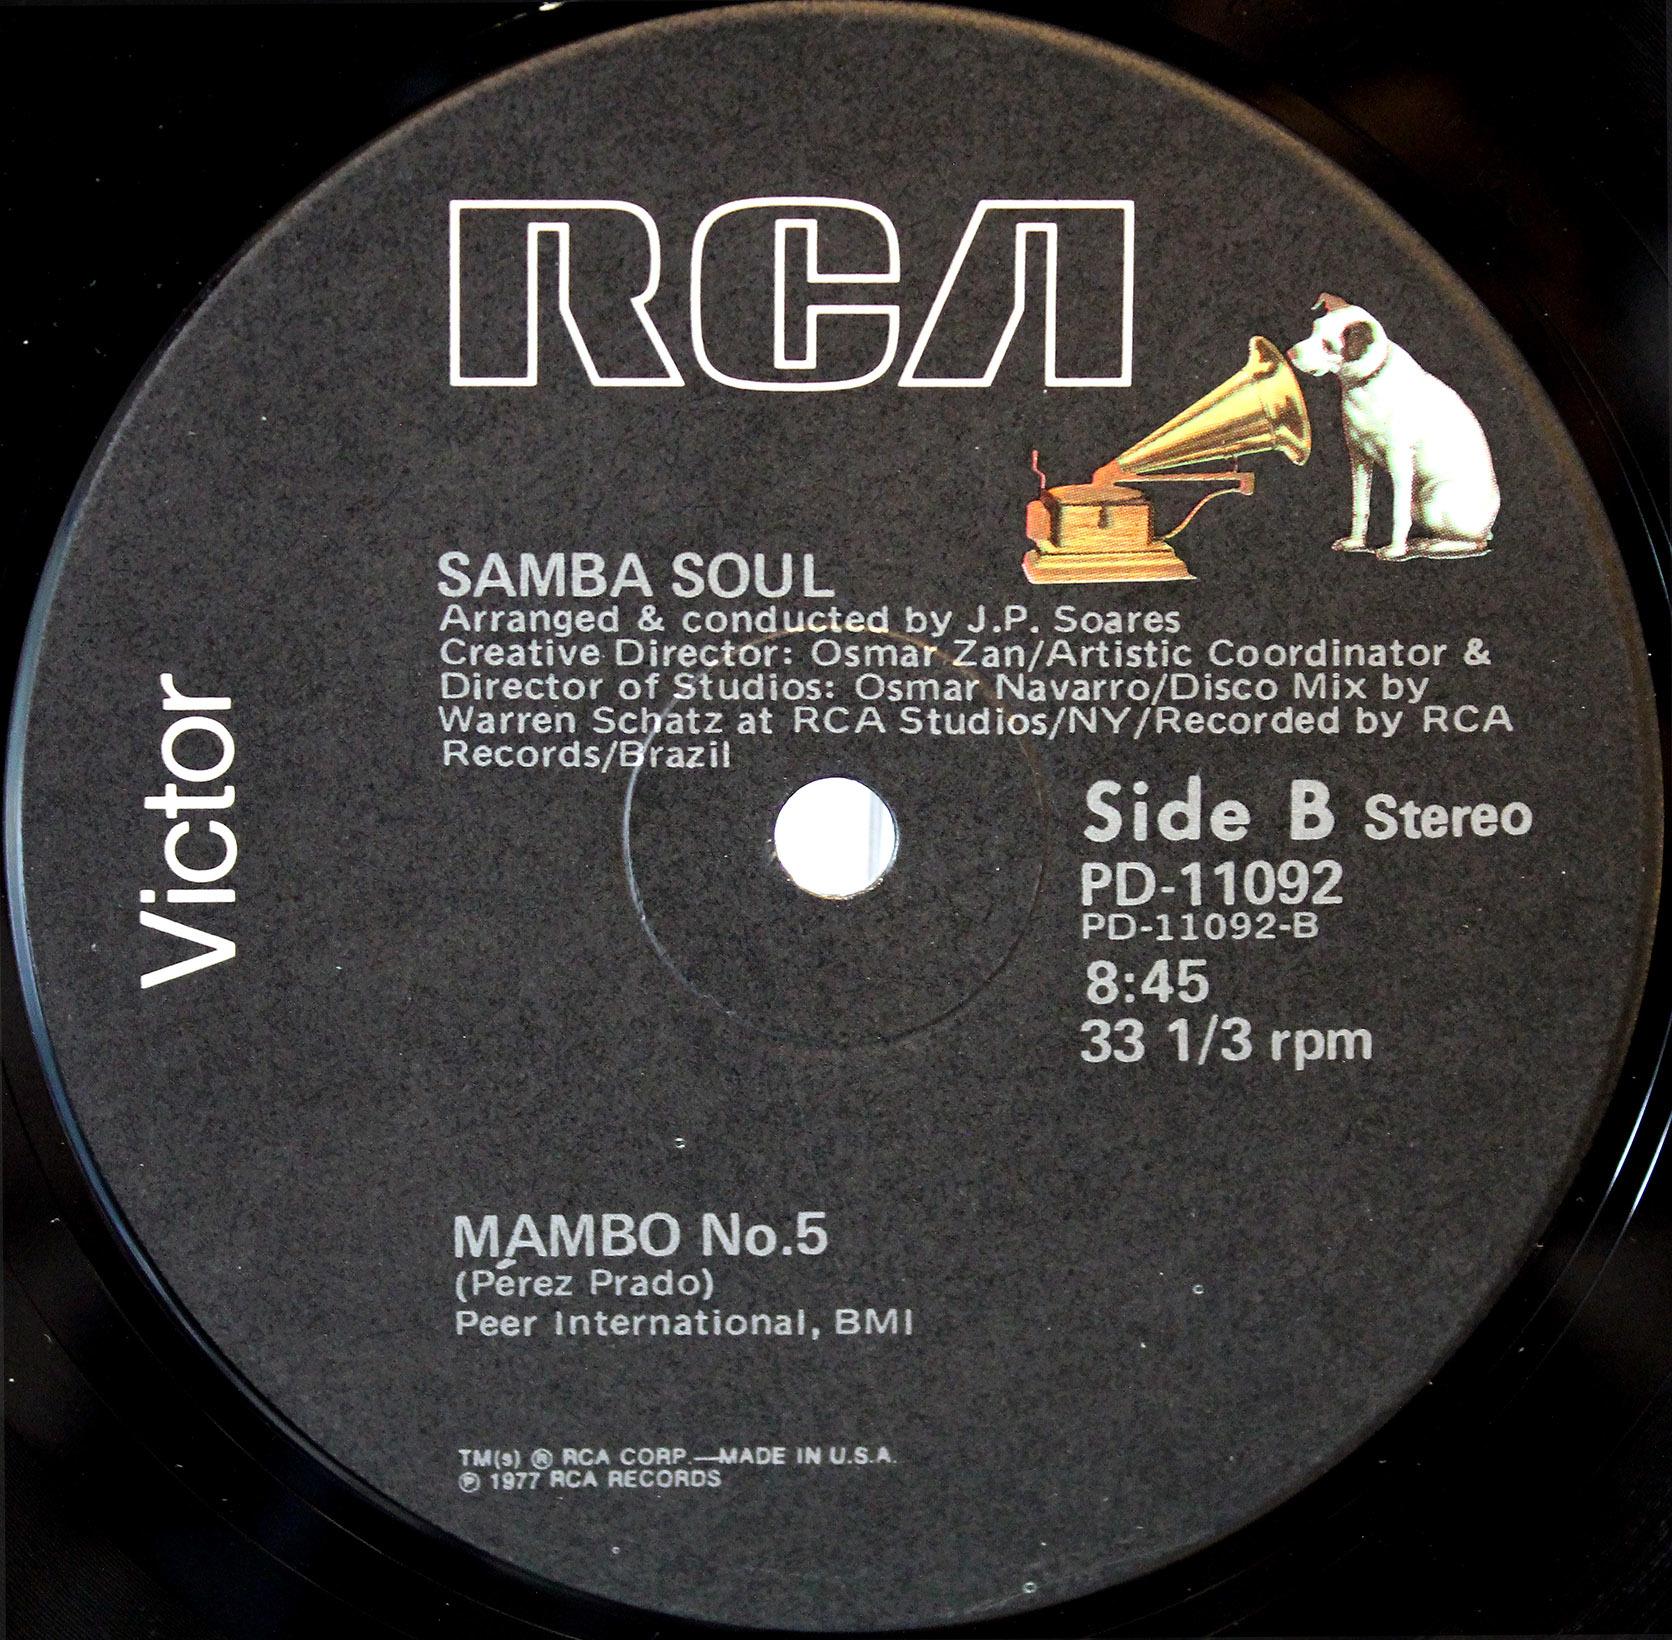 Samba Soul - Chove Chuva Mas Que Nada 04